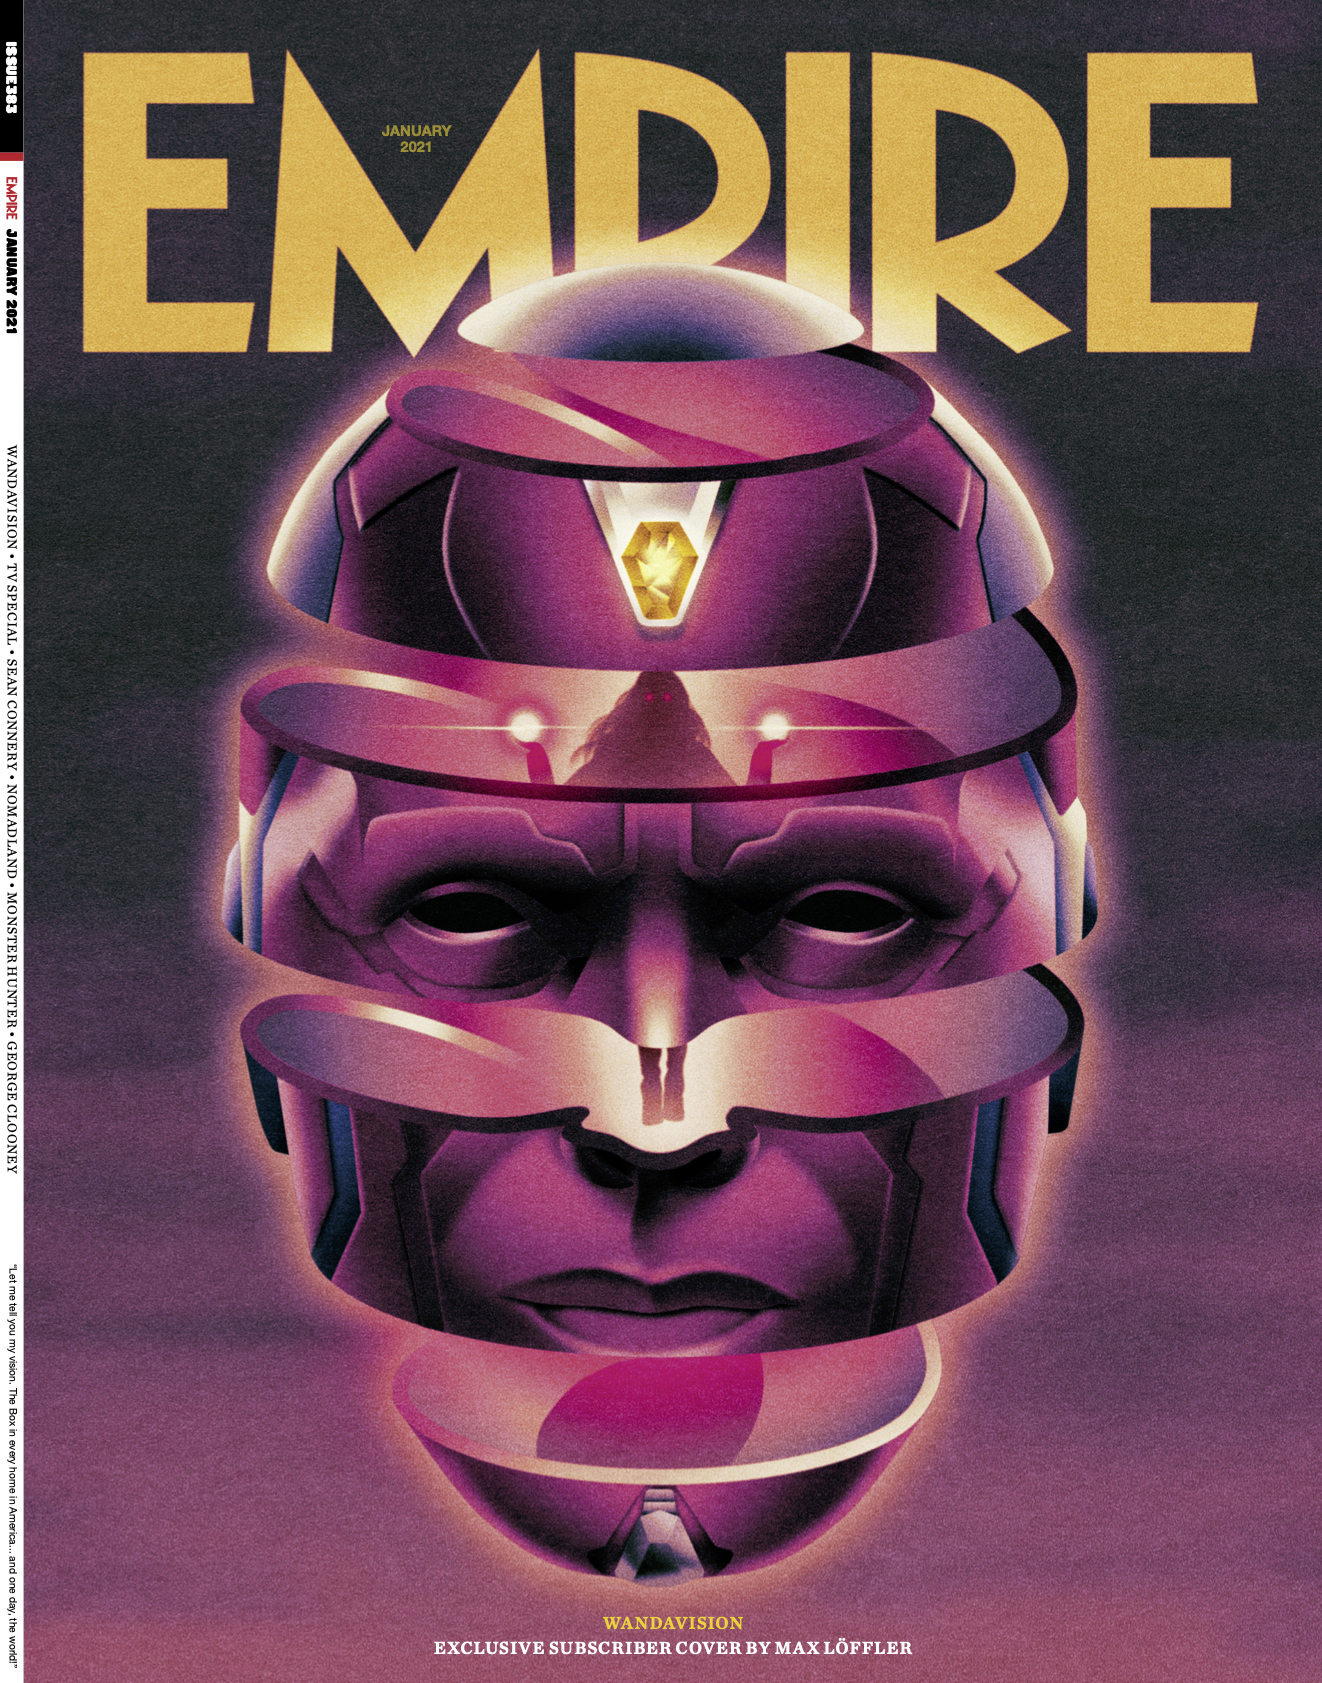 EMP_JAN21_COVER_SUBS.jpg